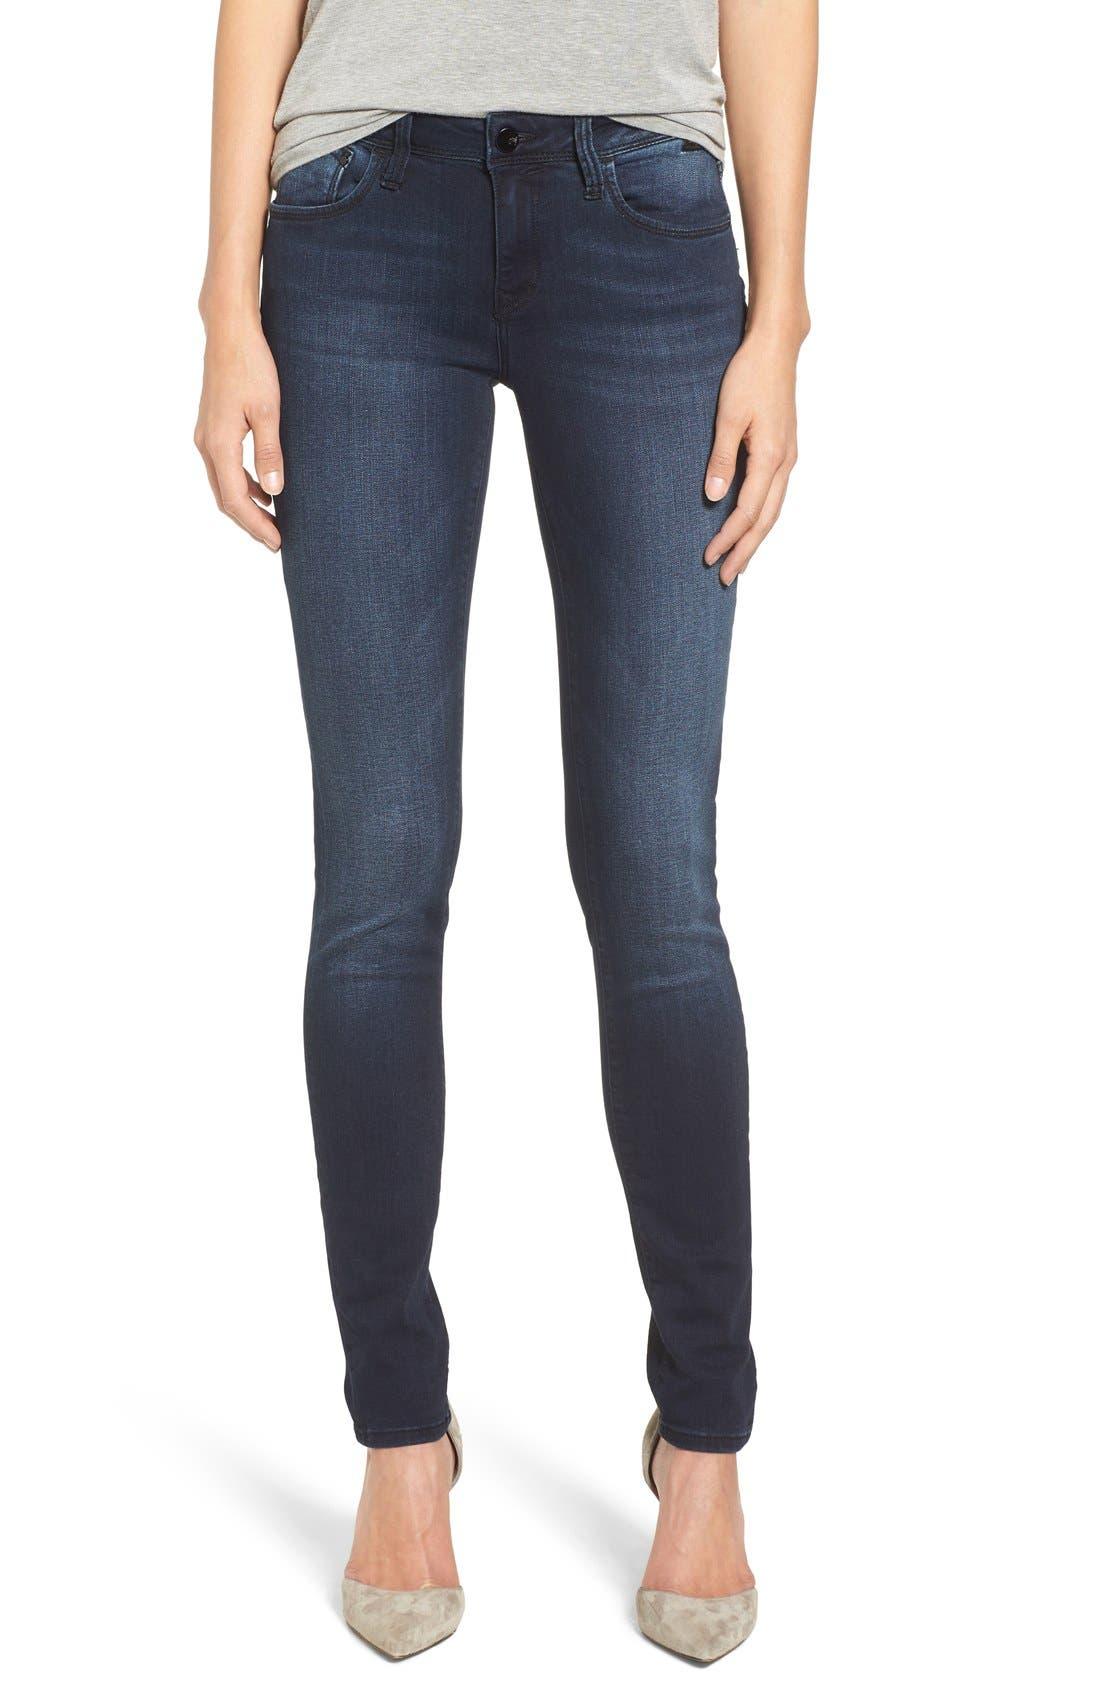 Alternate Image 1 Selected - Mavi Jeans Gold Alexa Stretch Skinny Jeans (Deep Feather) (Regular & Petite)